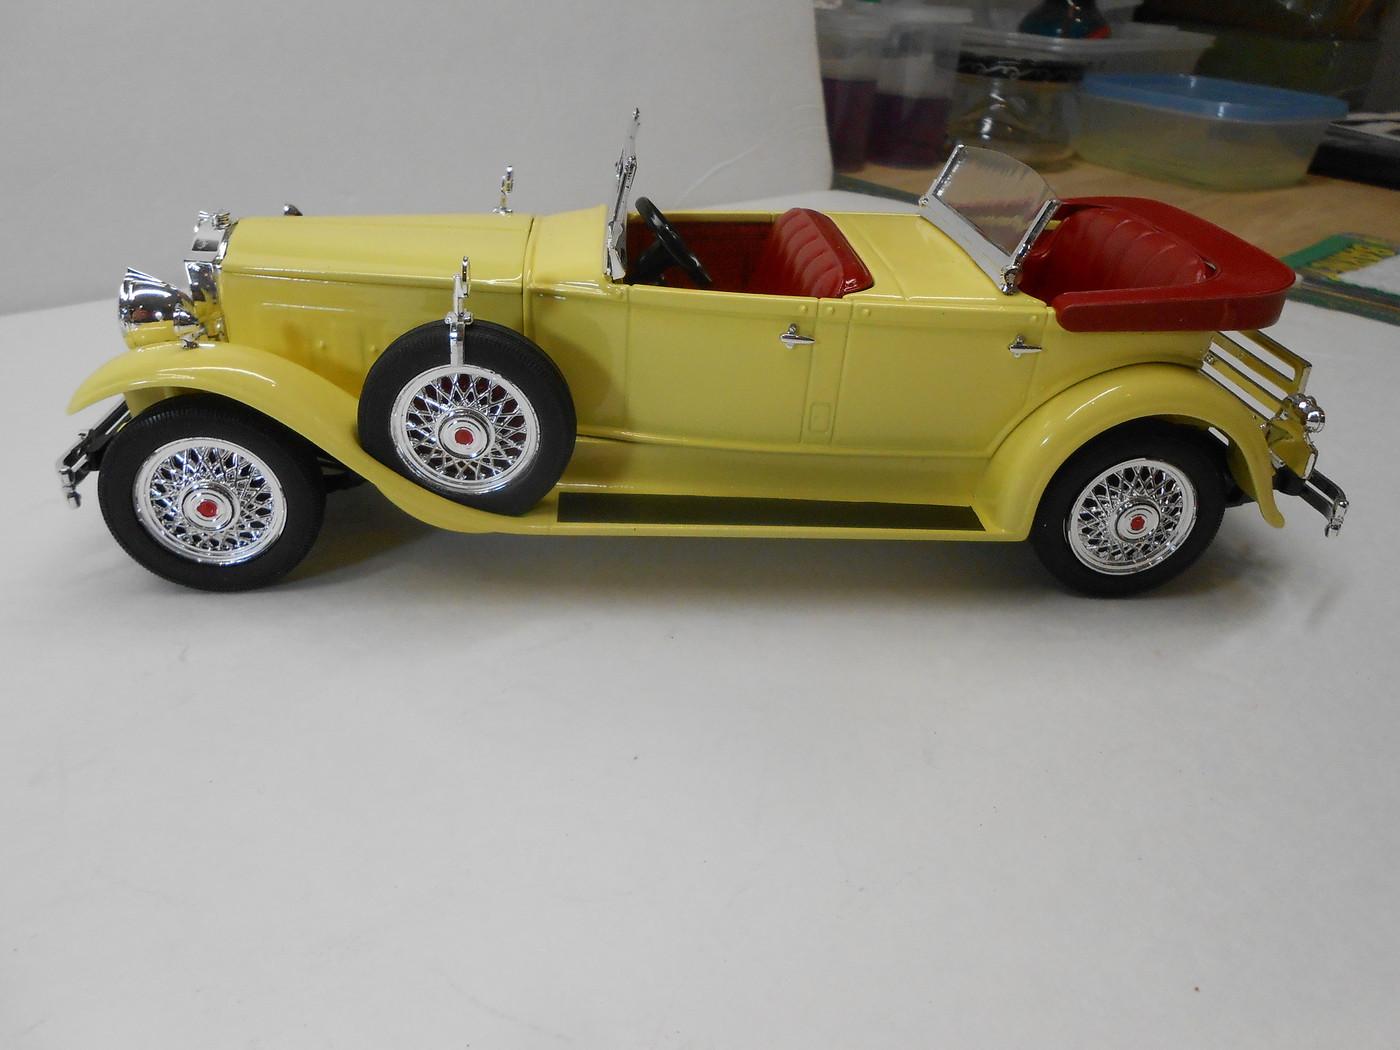 1930 Packard Sport Pheaton - Page 2 2v2EnaEFqxaTfRW